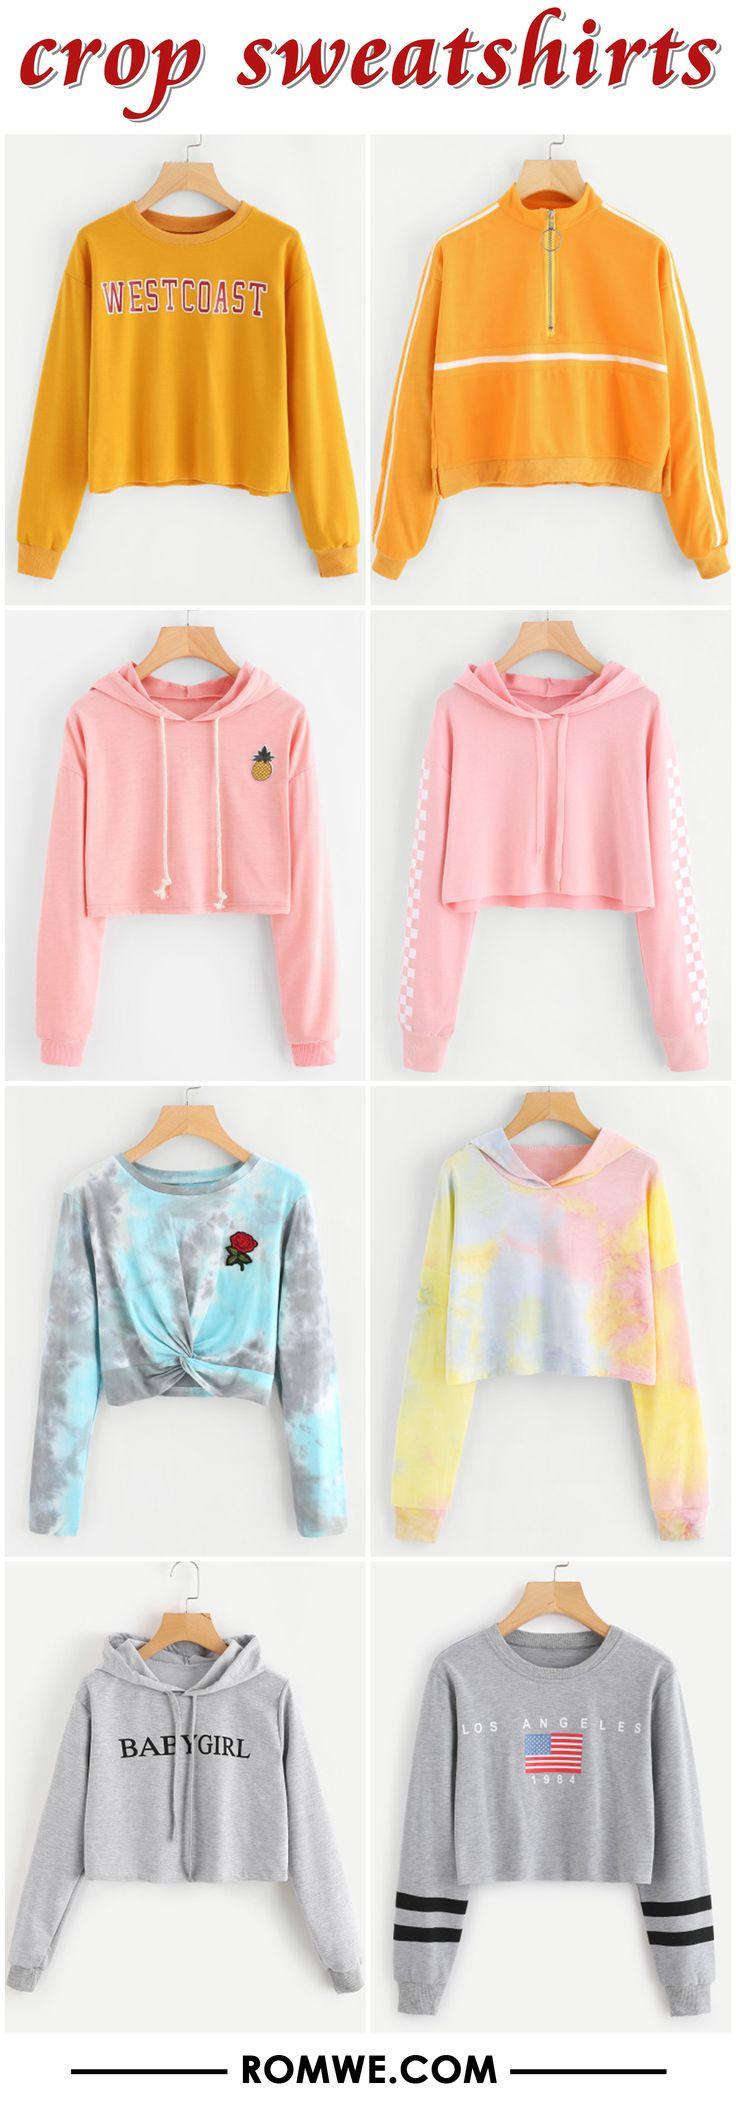 cozy & chic crop sweatshirts from romwe.com